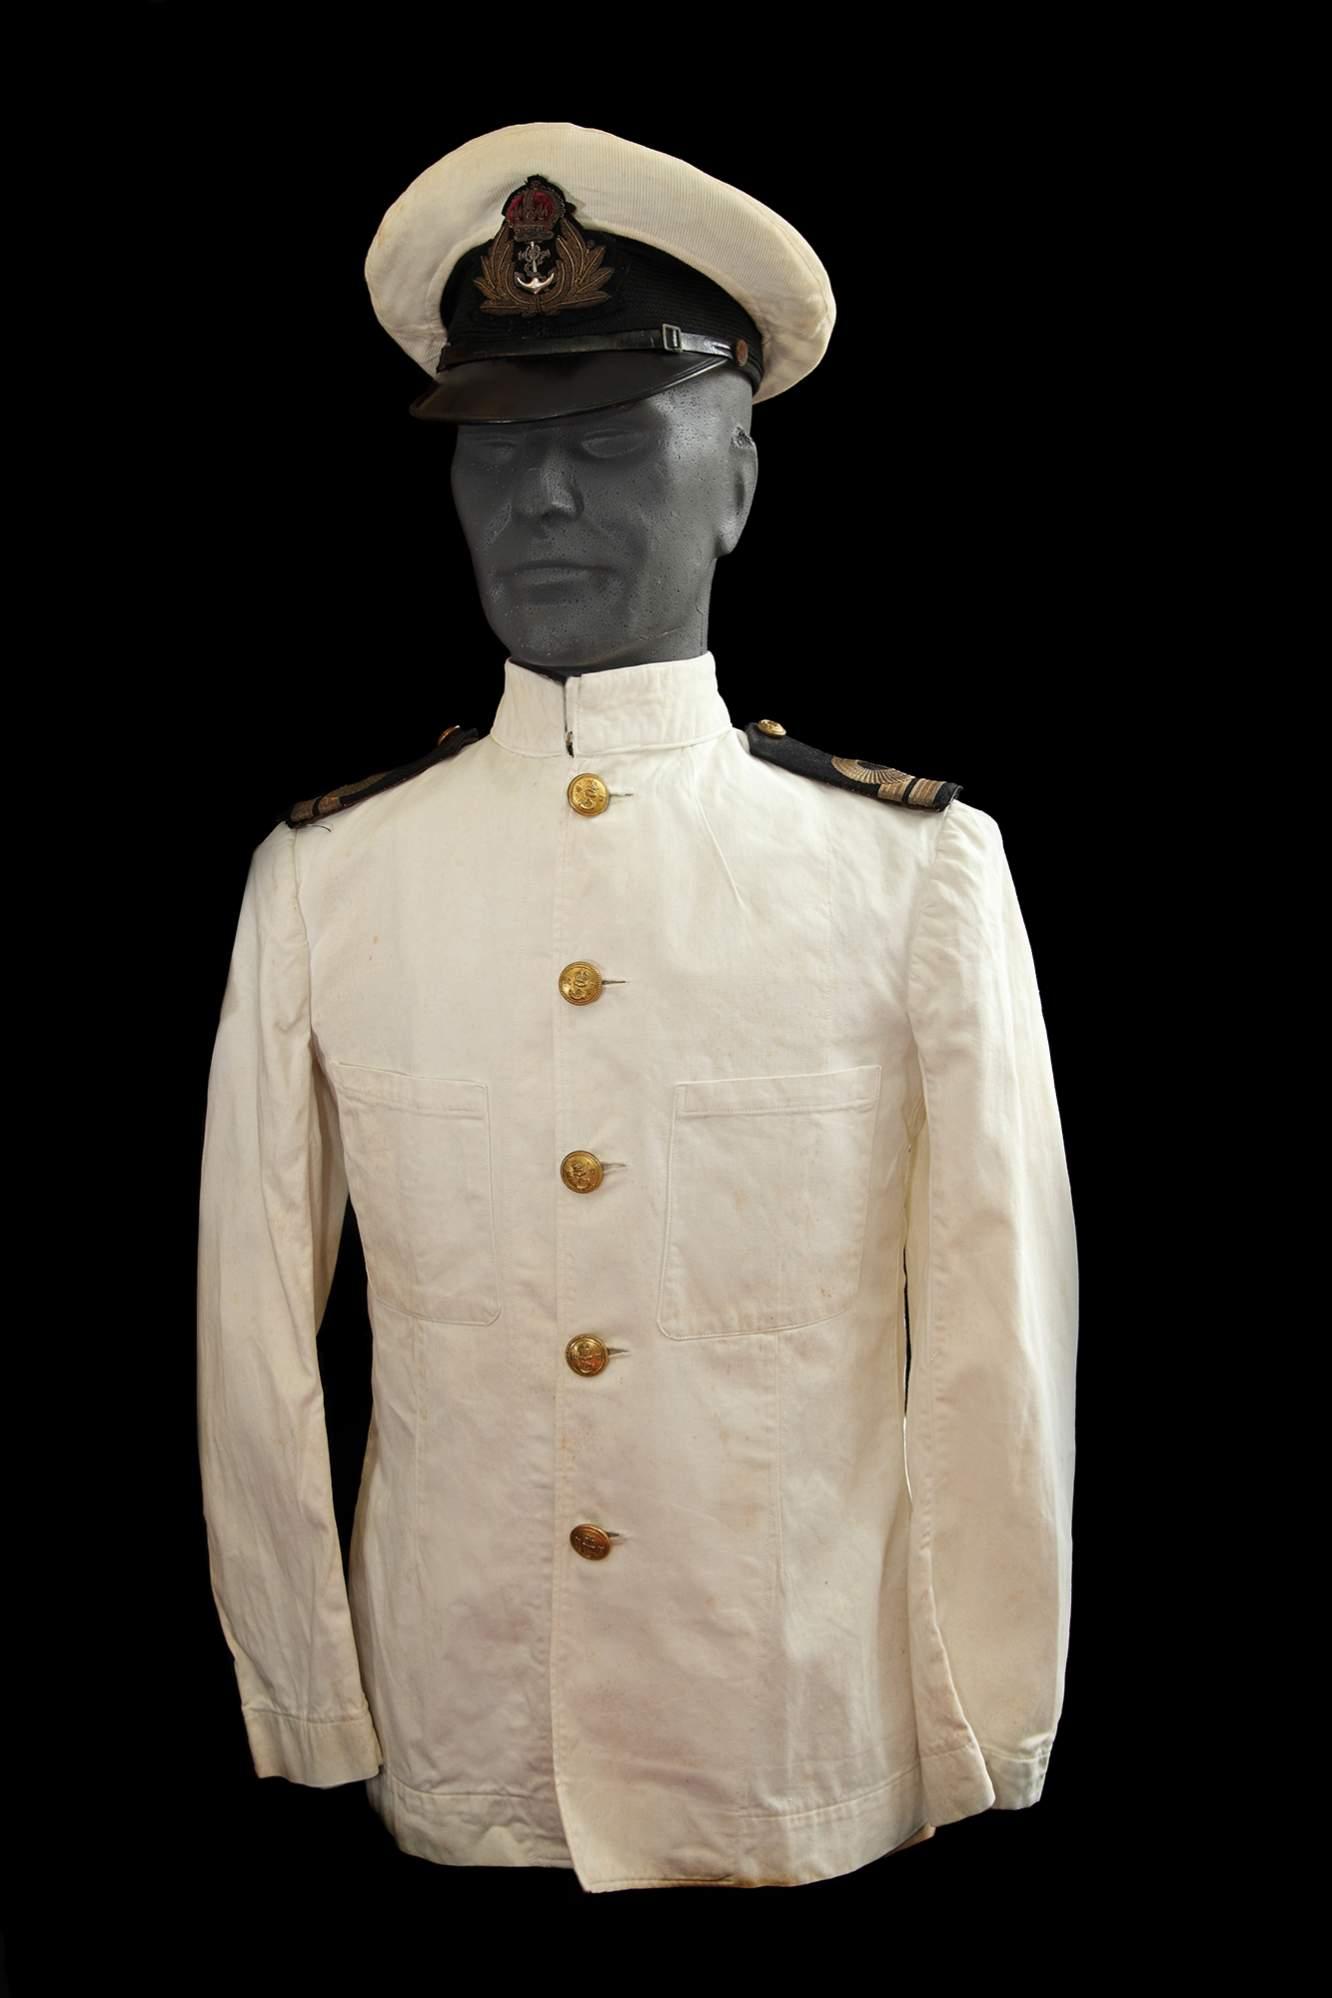 Royal navy white dress uniform